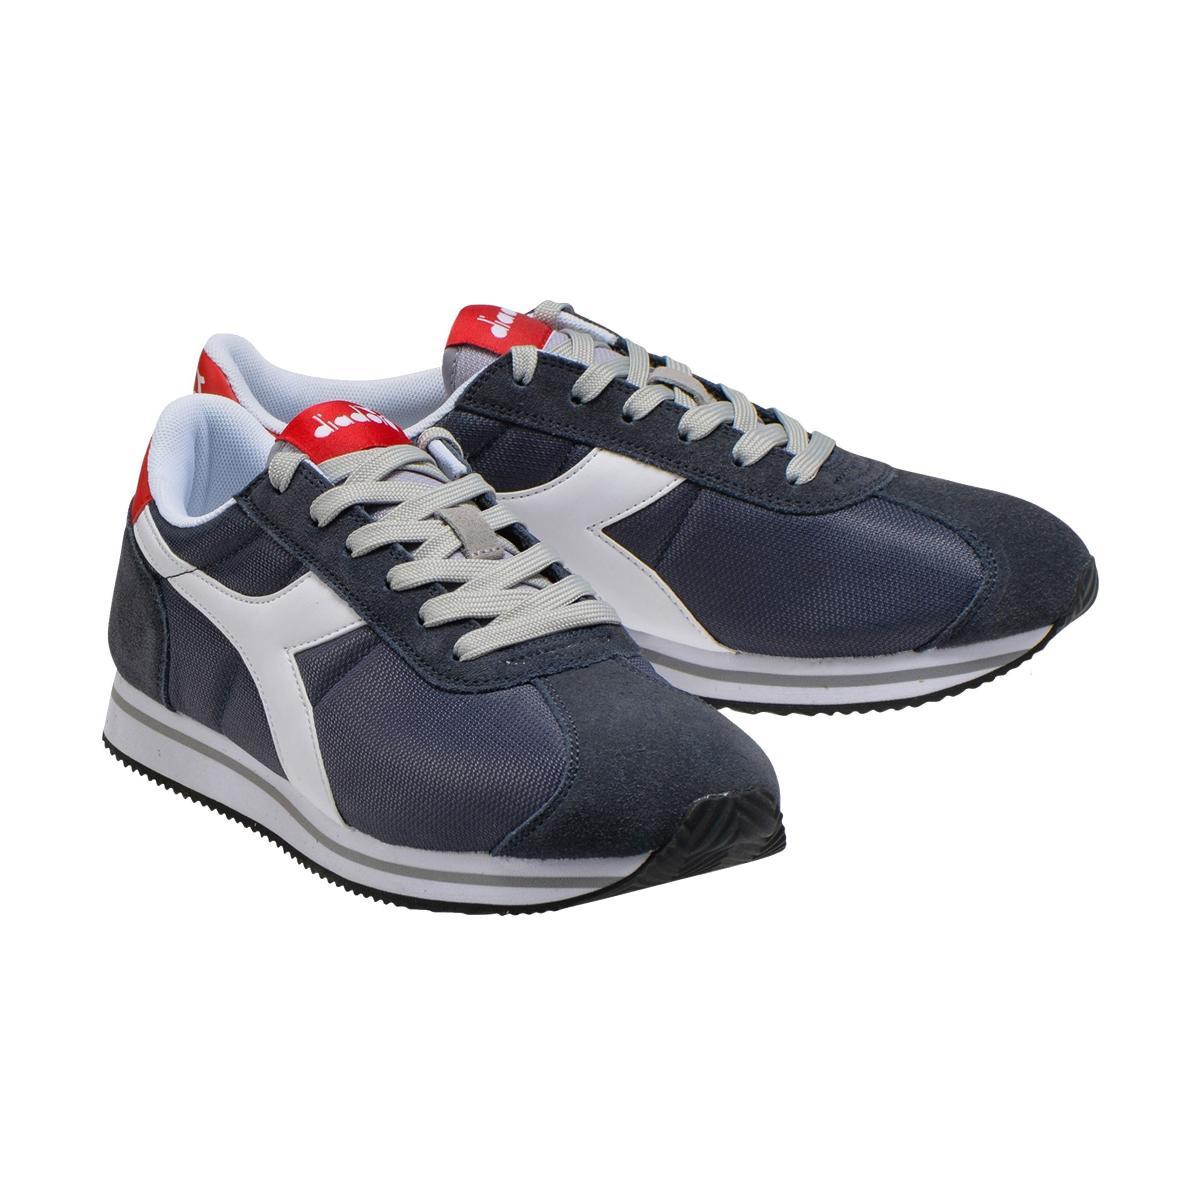 Scarpe Sneakers Diadora VEGA sportive da uomo rif. 101.175065